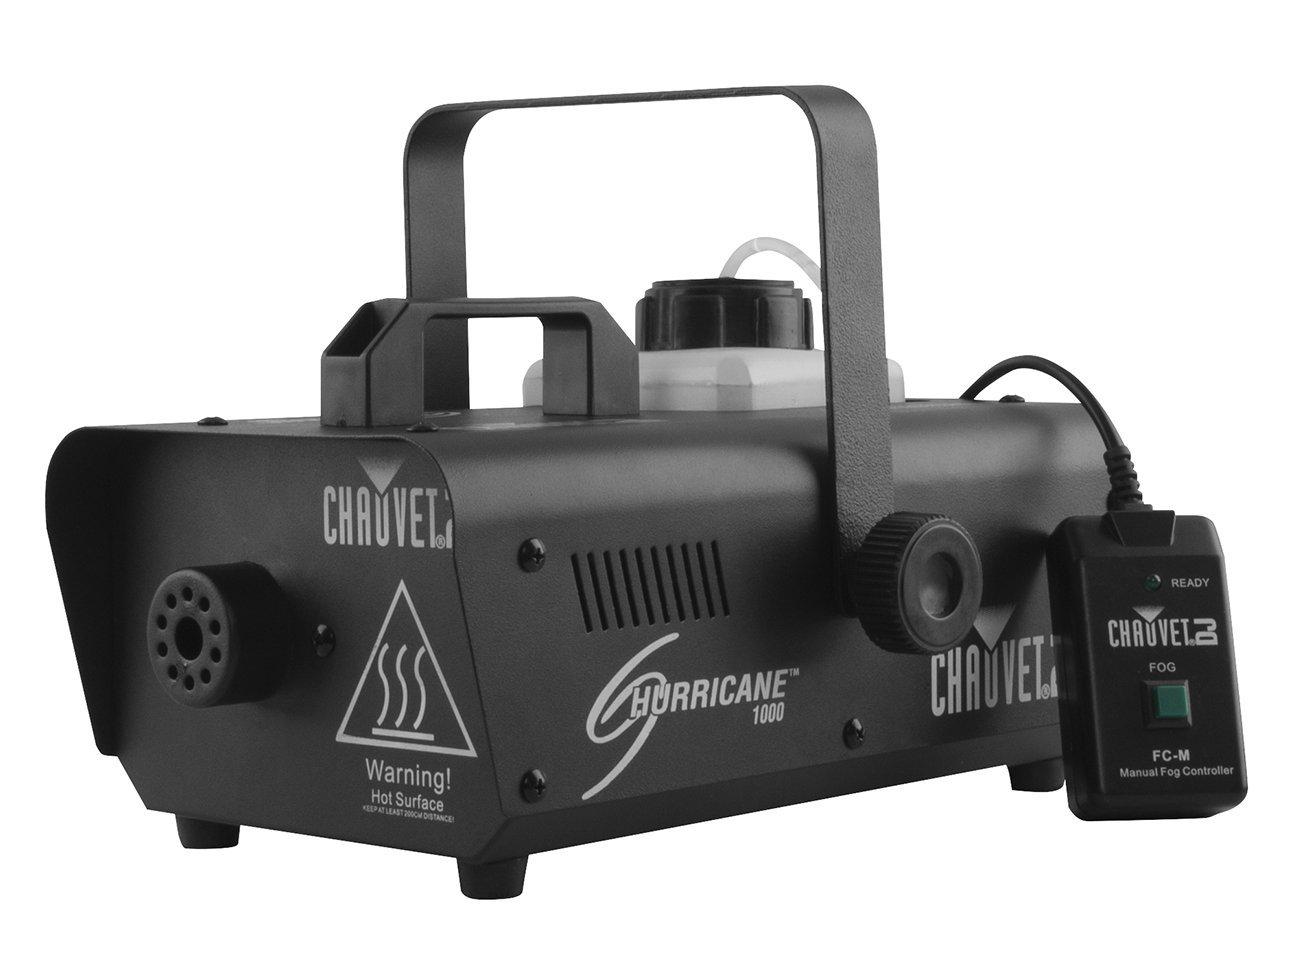 CHAUVET DJ Hurricane 1000 Compact Fog Machine w/Wired Remote by CHAUVET DJ (Image #1)